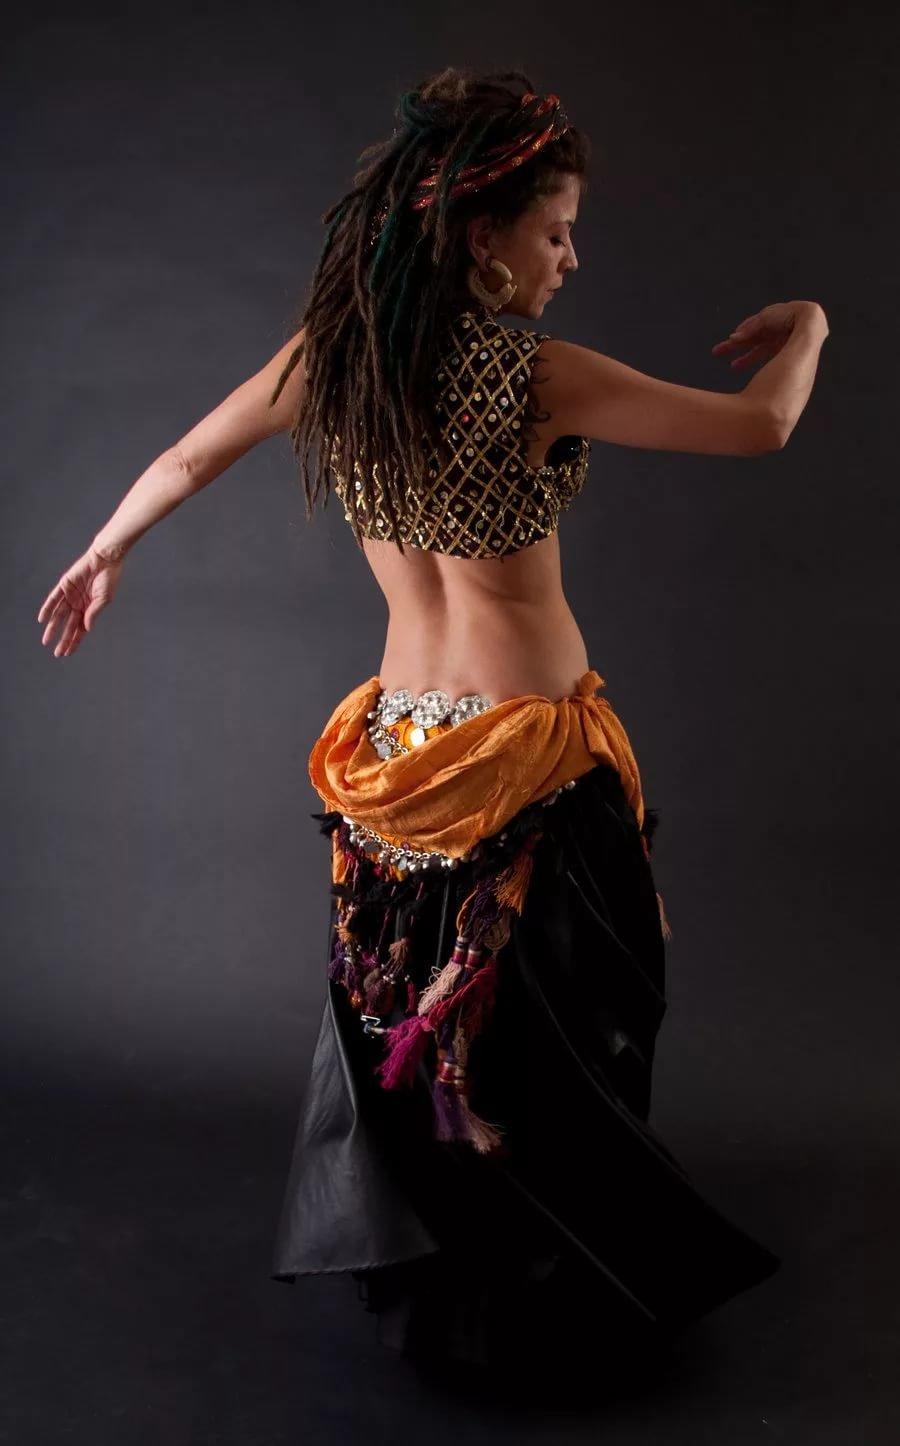 елка танцовщицы танца живота фото дальше